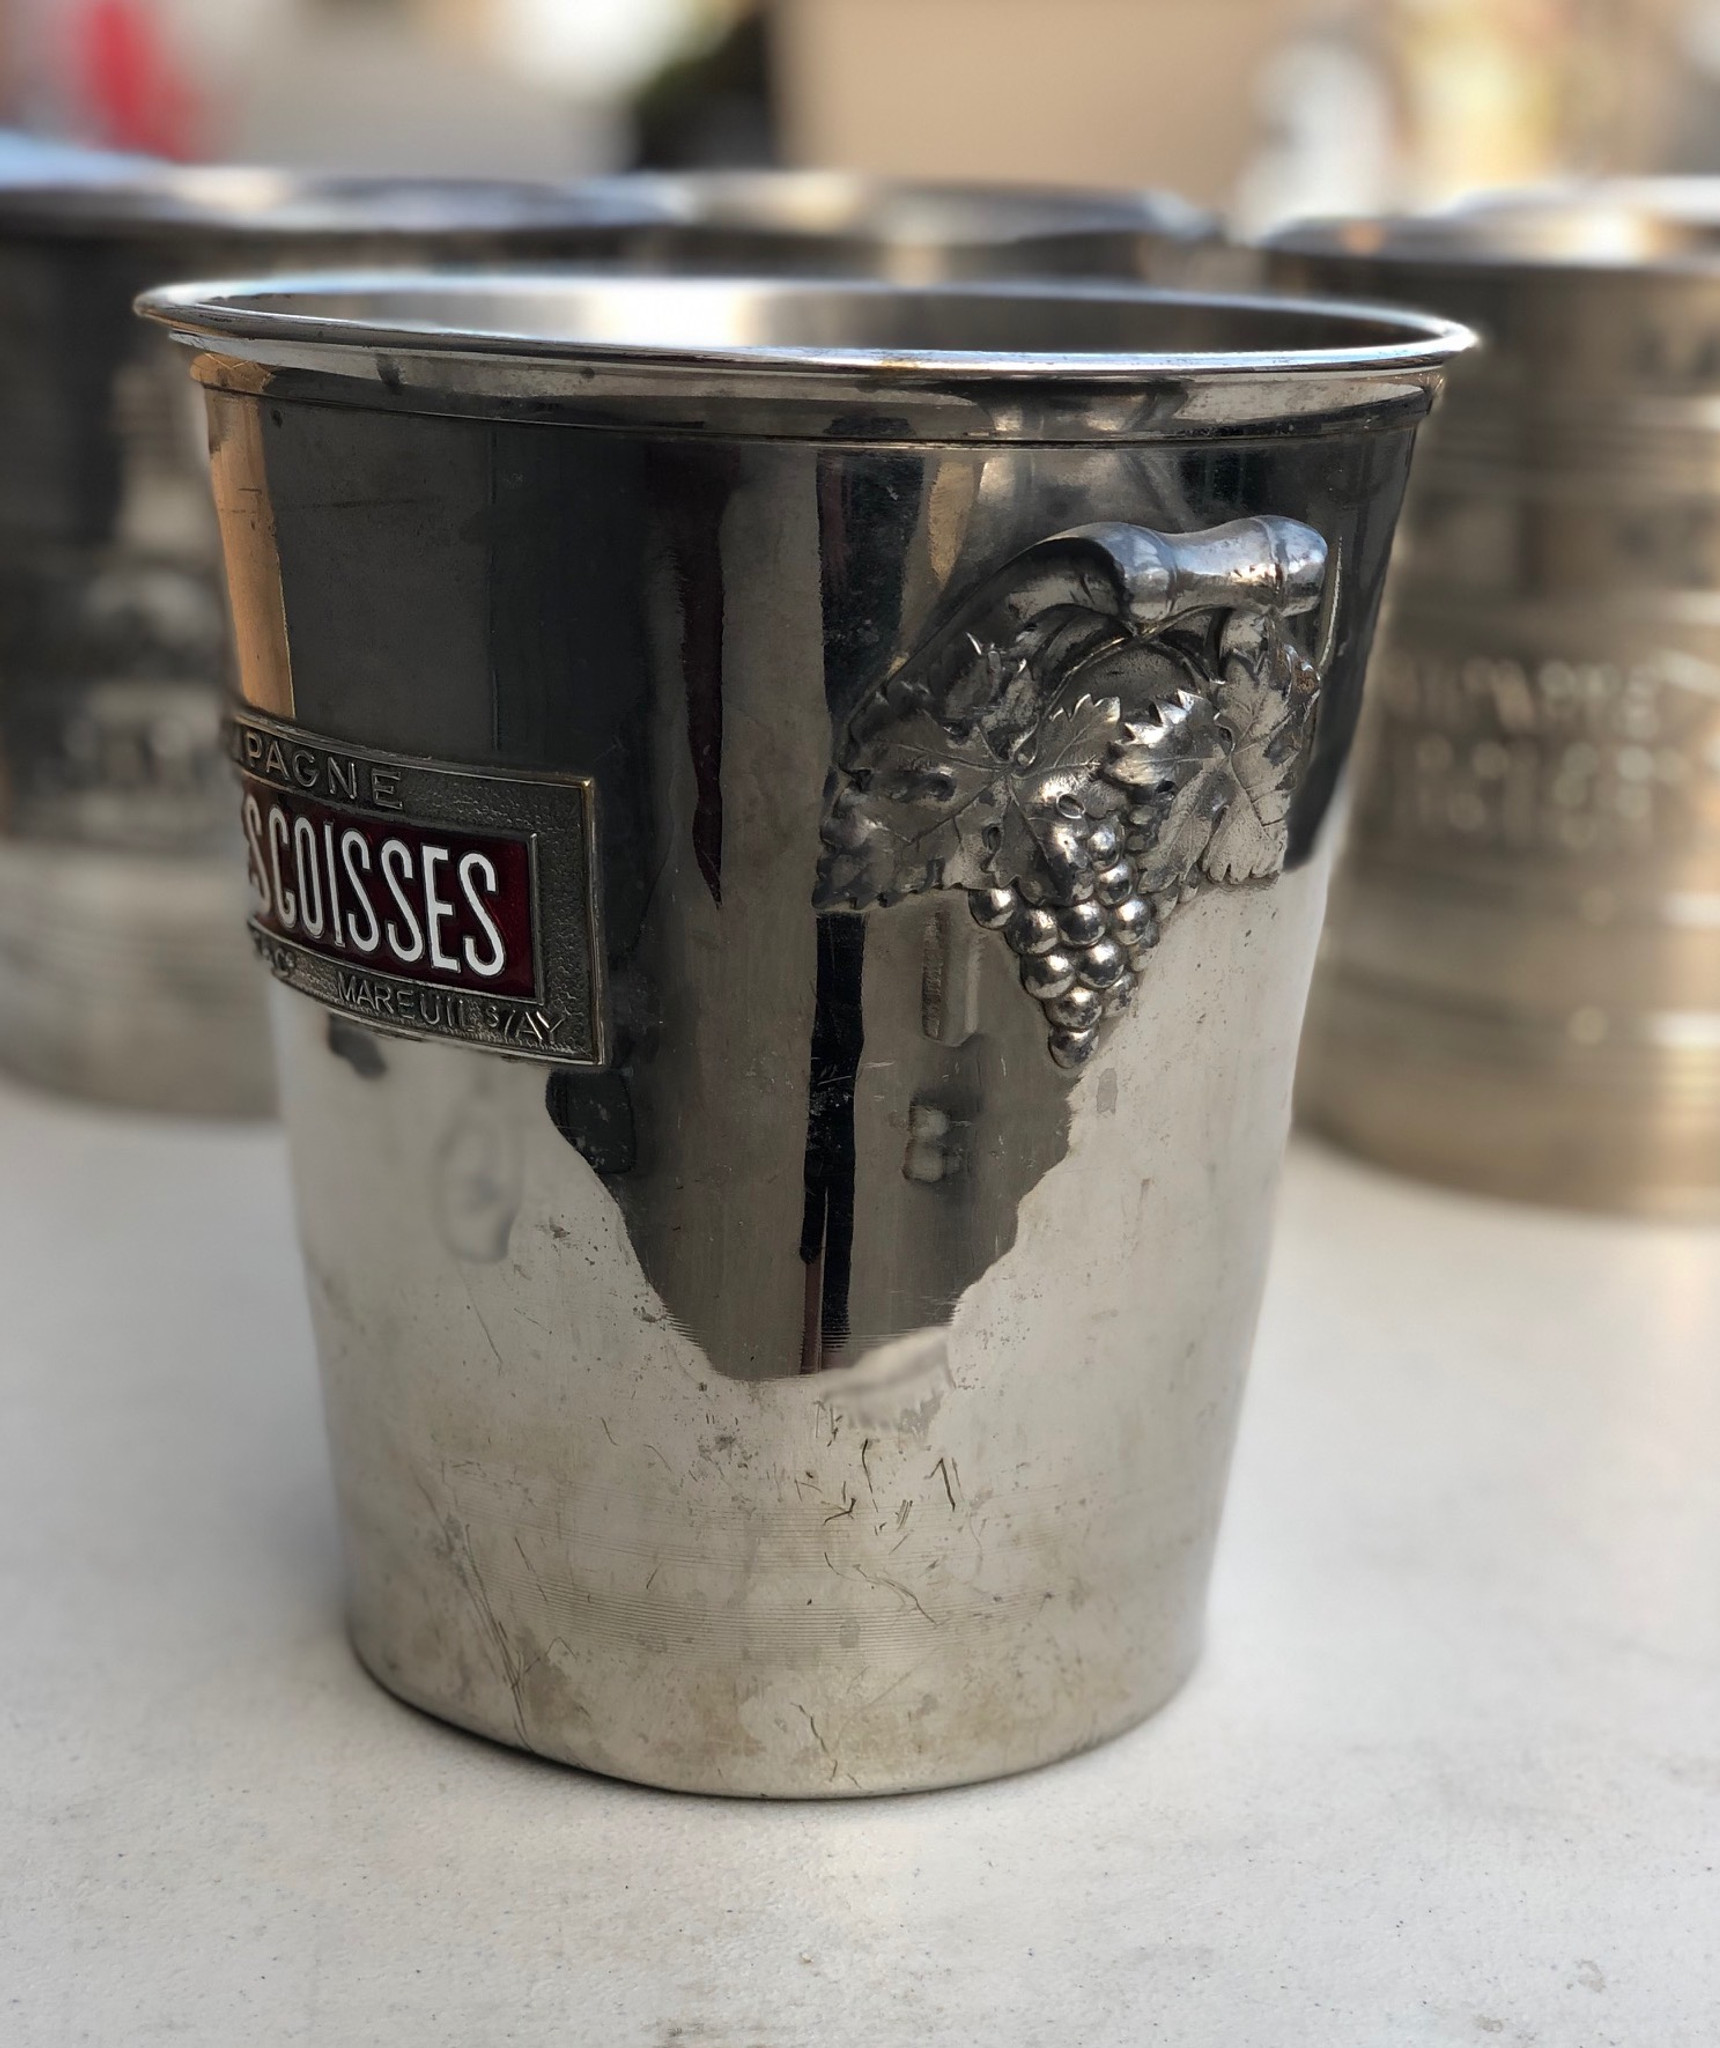 Vintage French Champagne Bucket - Clos Des Coisses